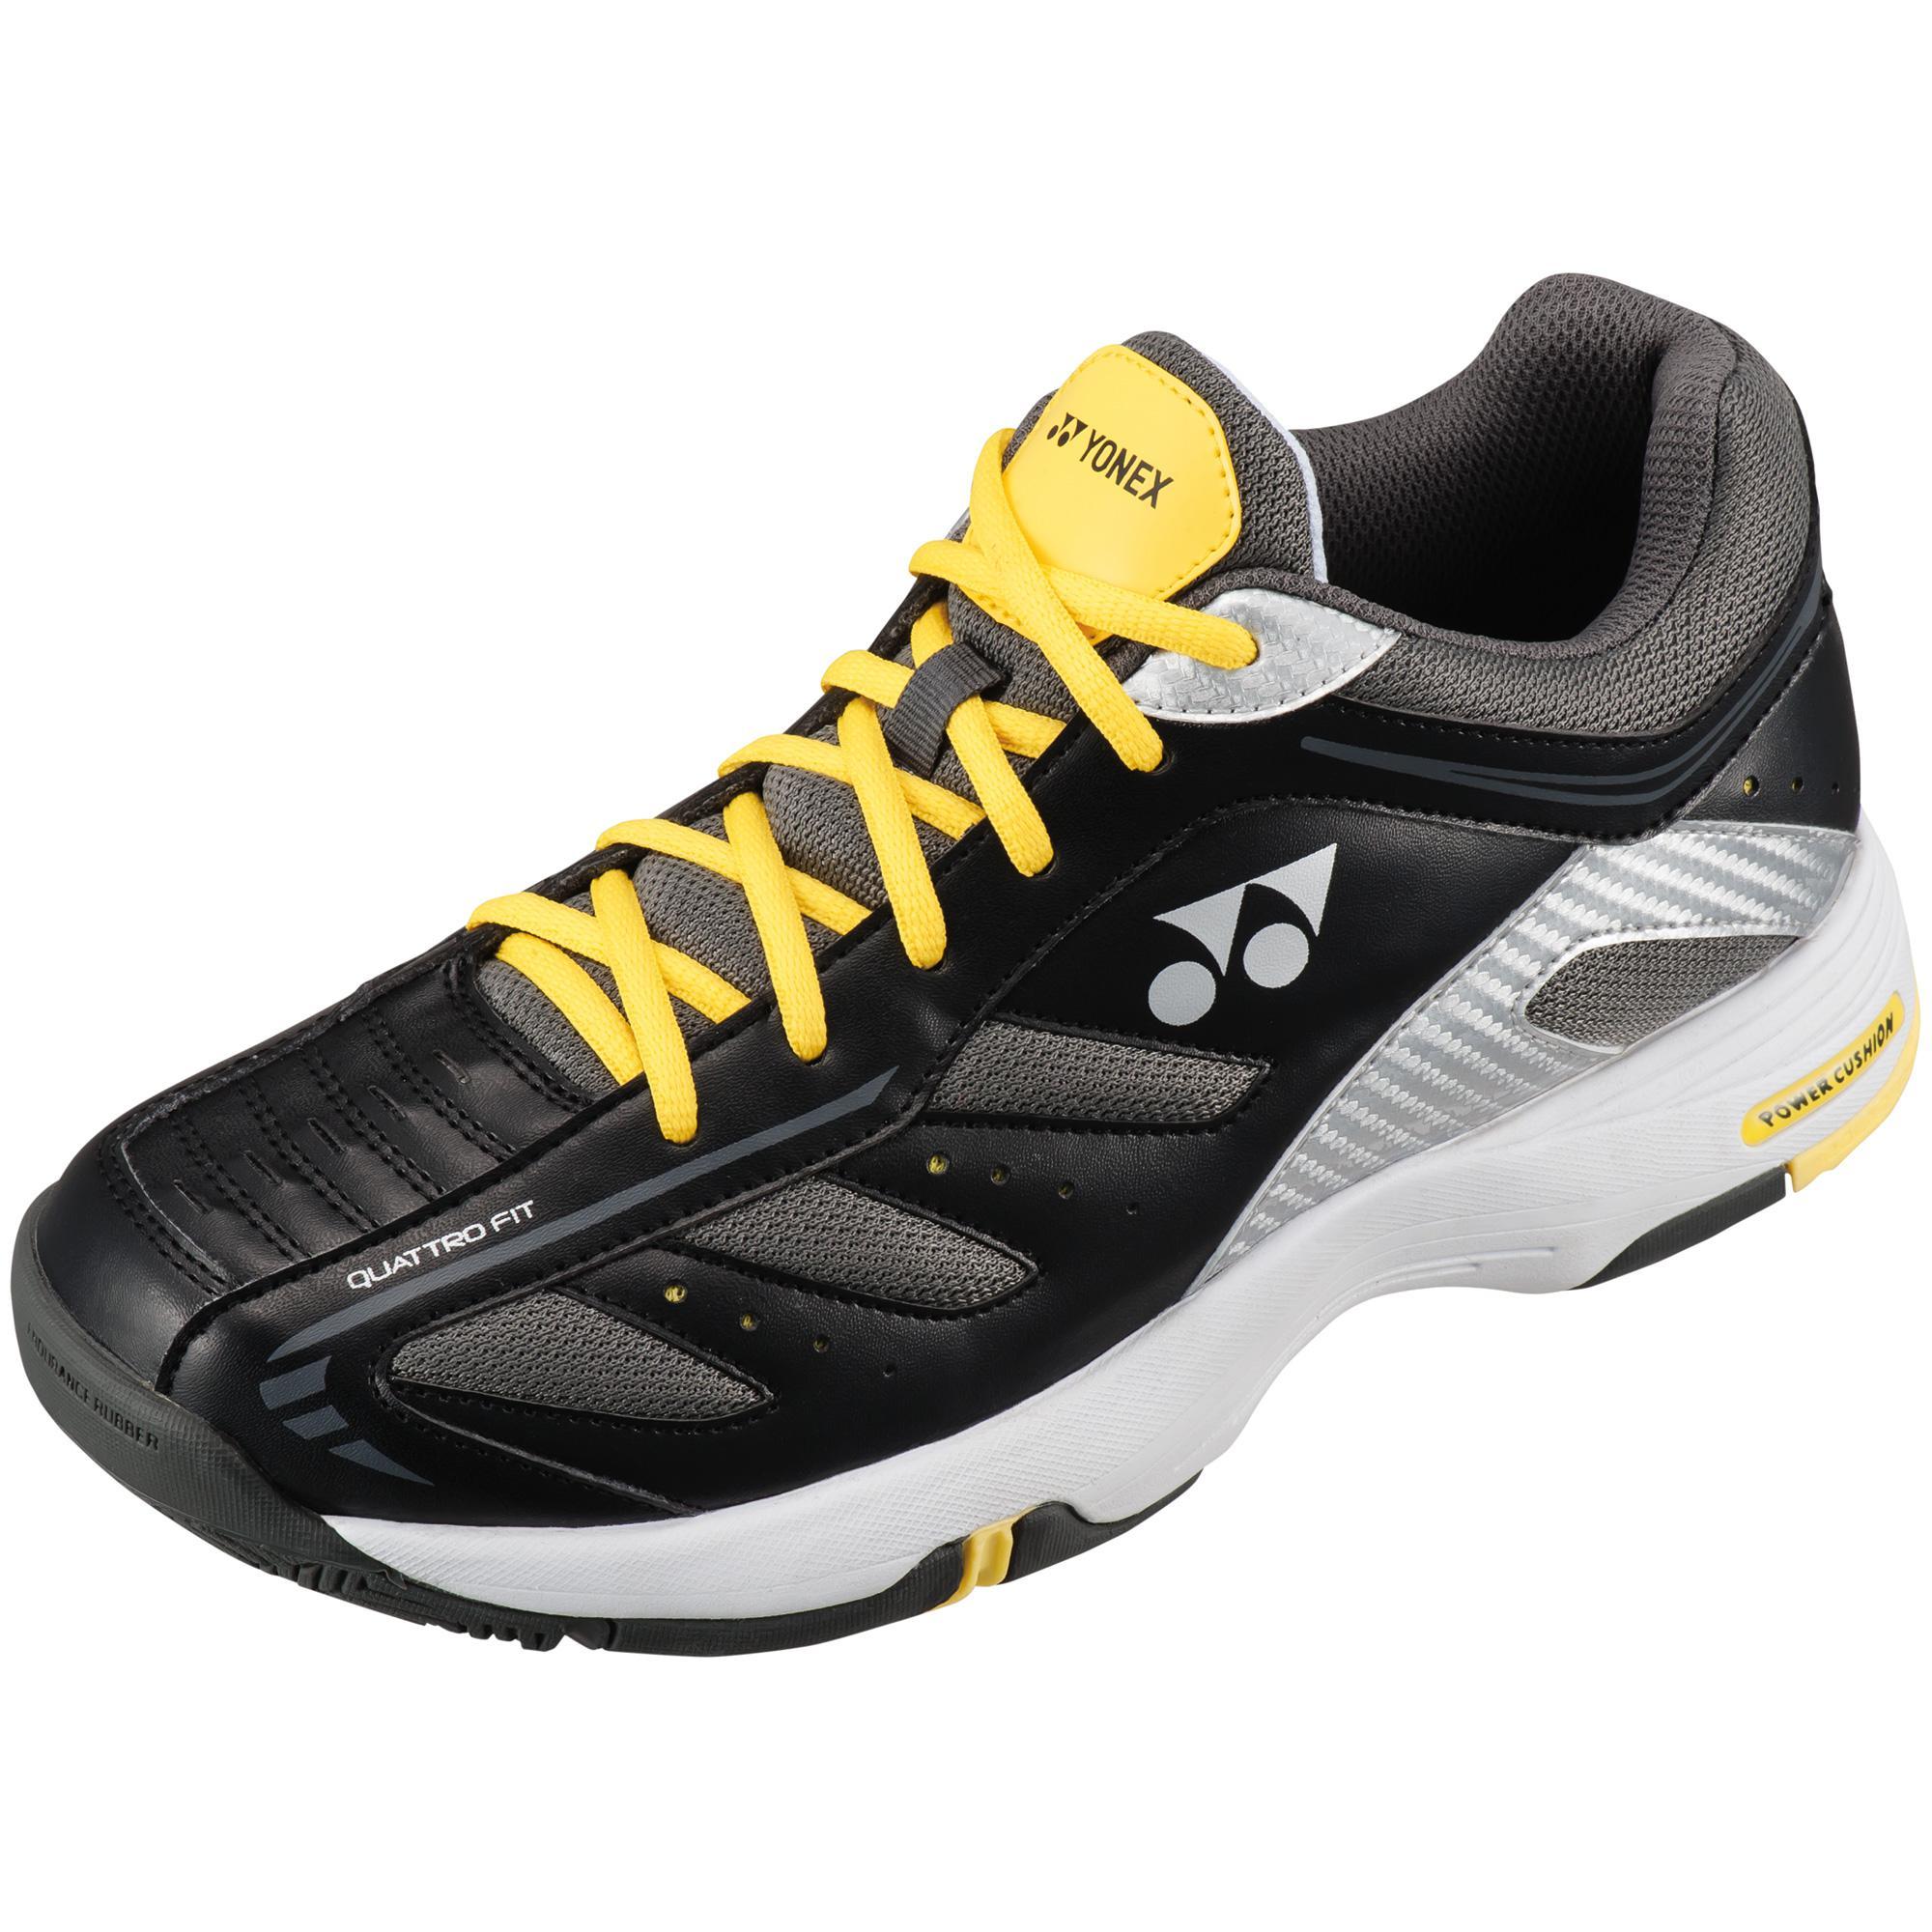 Yonex Mens SHT Cefiro All-Court Tennis Shoes - Black - Tennisnuts.com